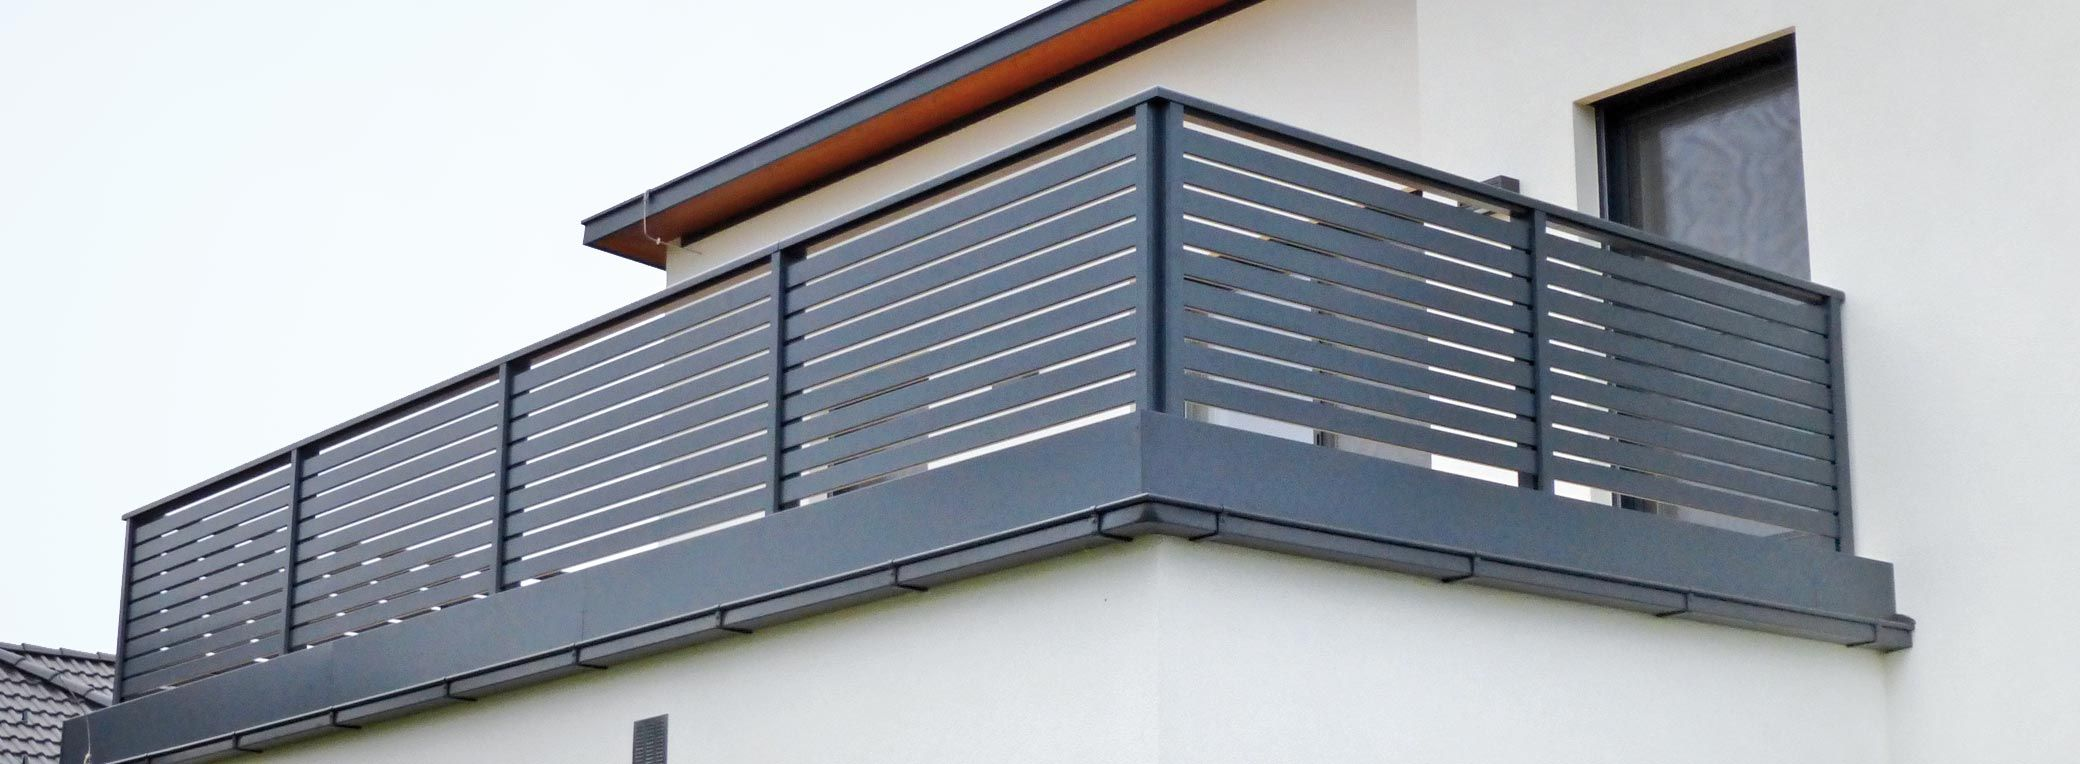 Balkongelander Mit Querlattung Und Lochblech Balkon Gelander Design Gelander Balkon Balkon Gelander Holz